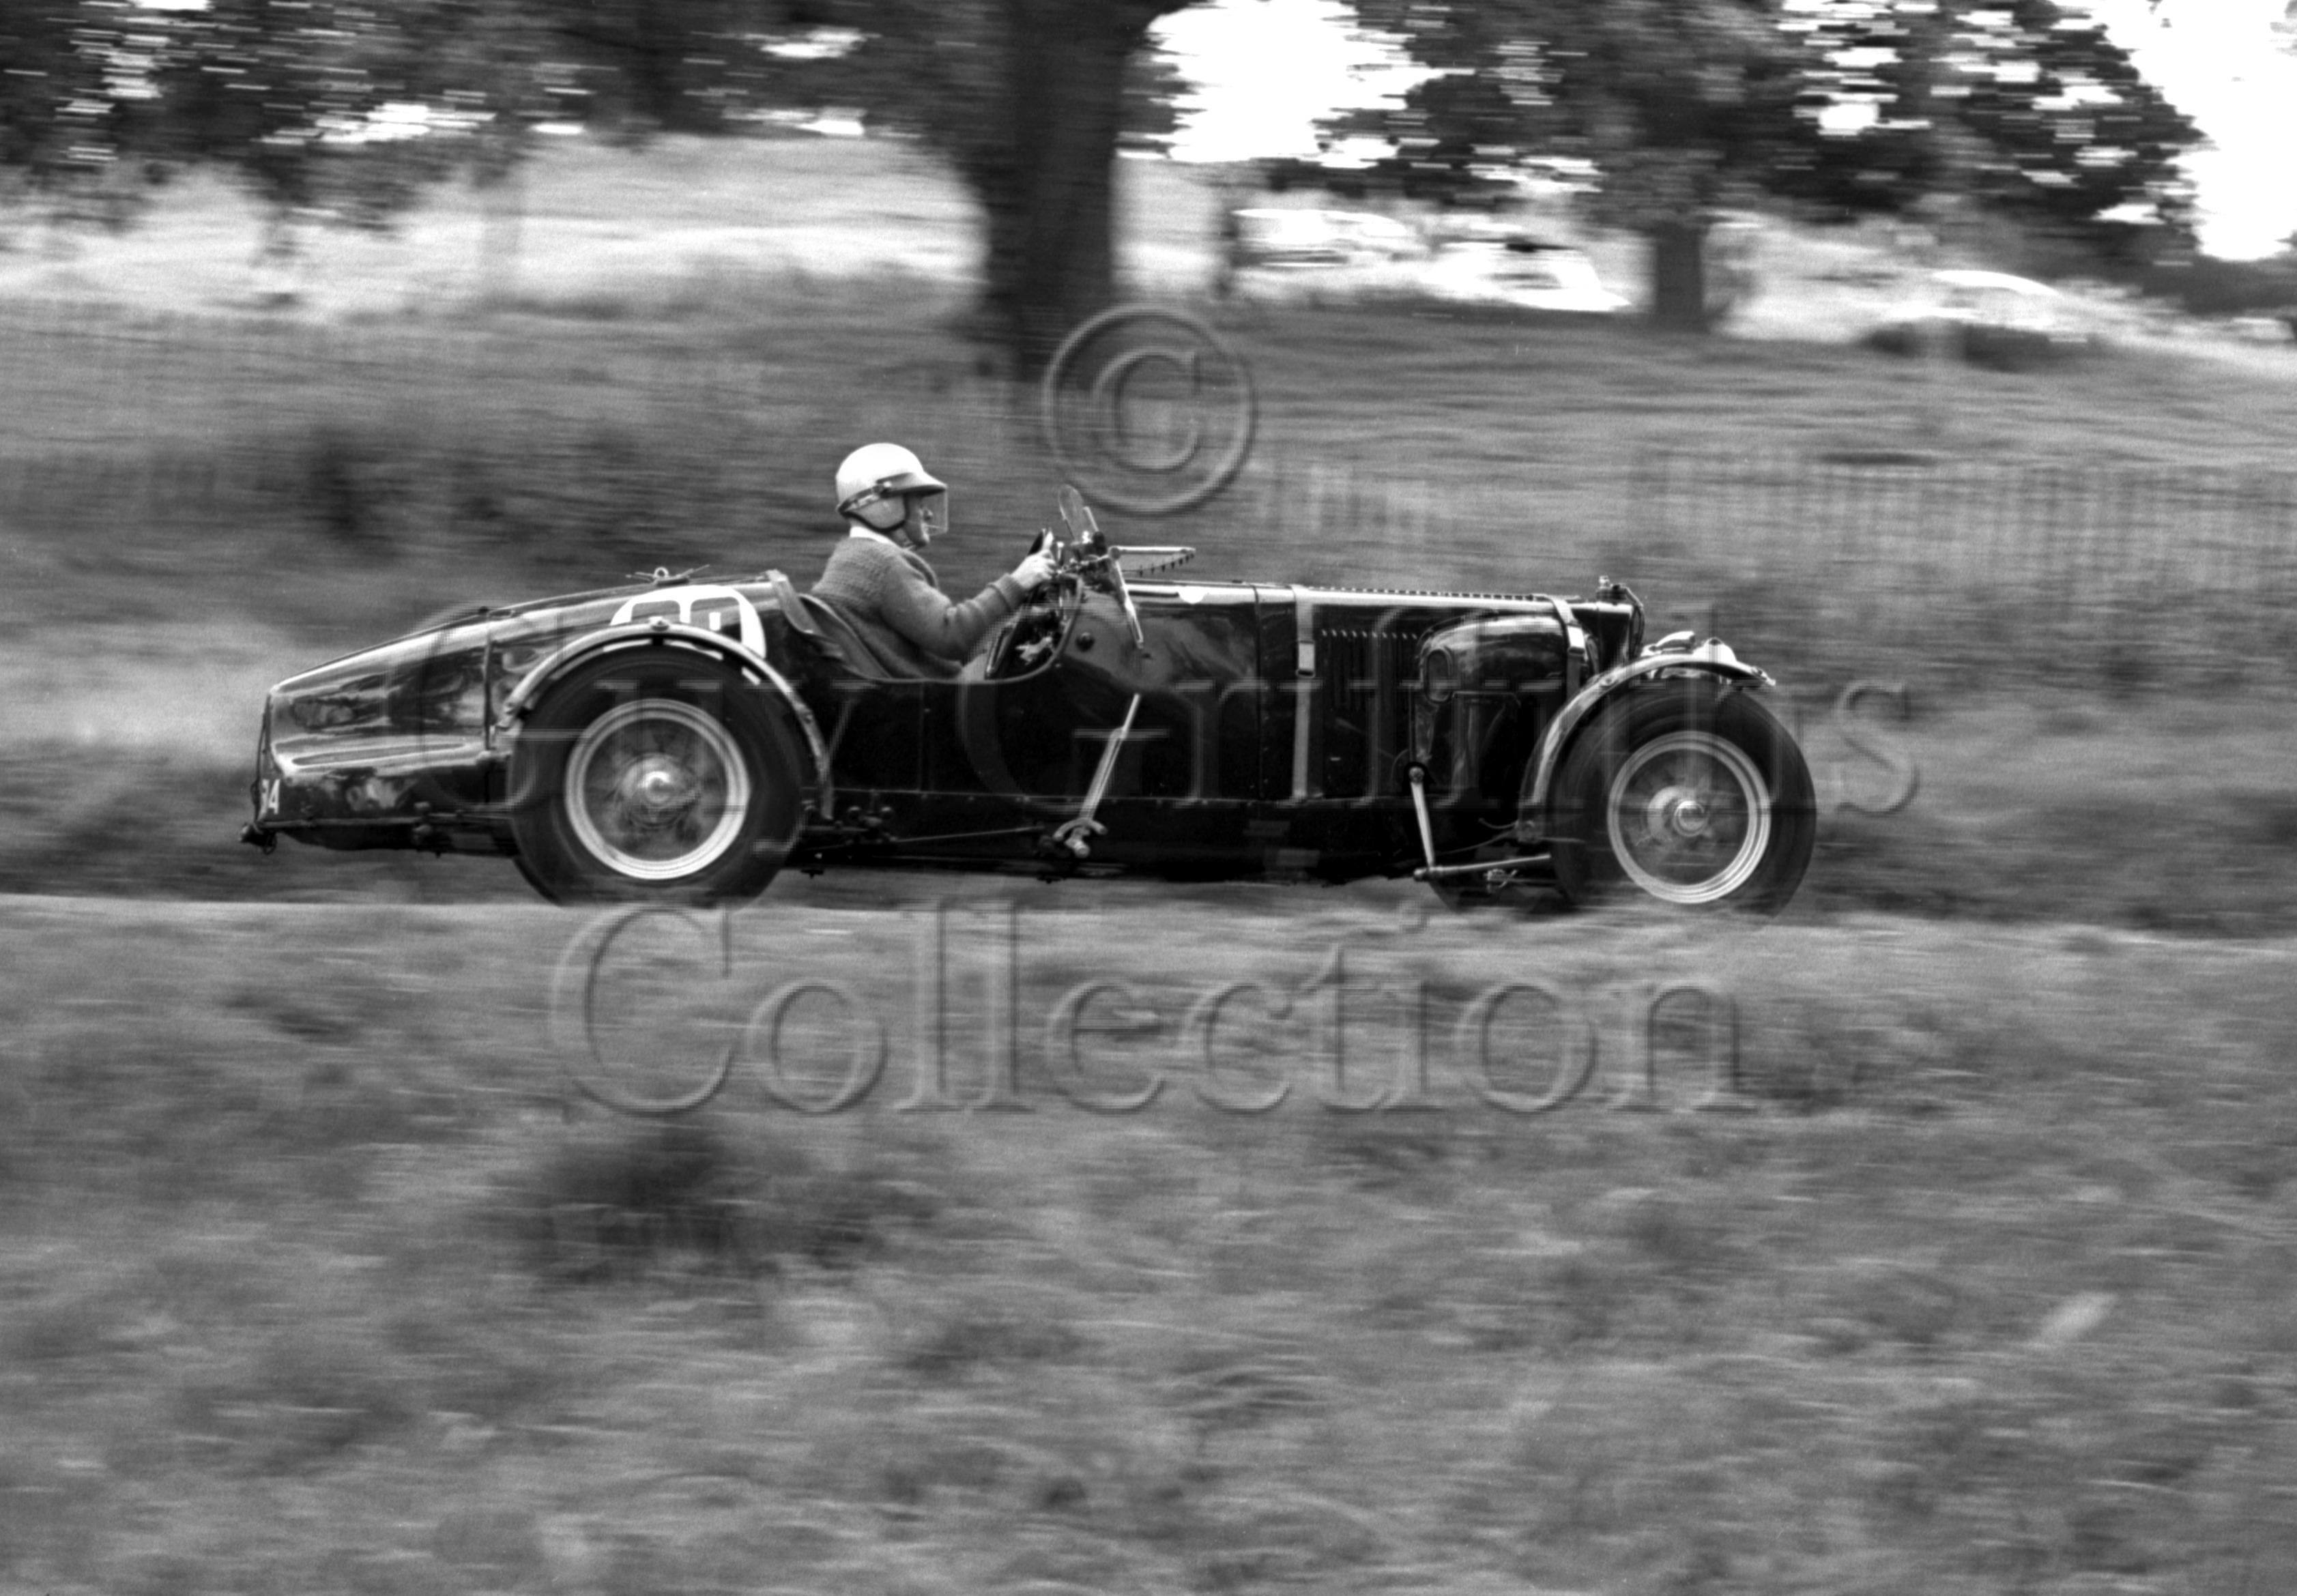 77-493—Aston-Martin-CMC-614–Prescott–18-08-1963.jpg - Guy Griffiths Collection